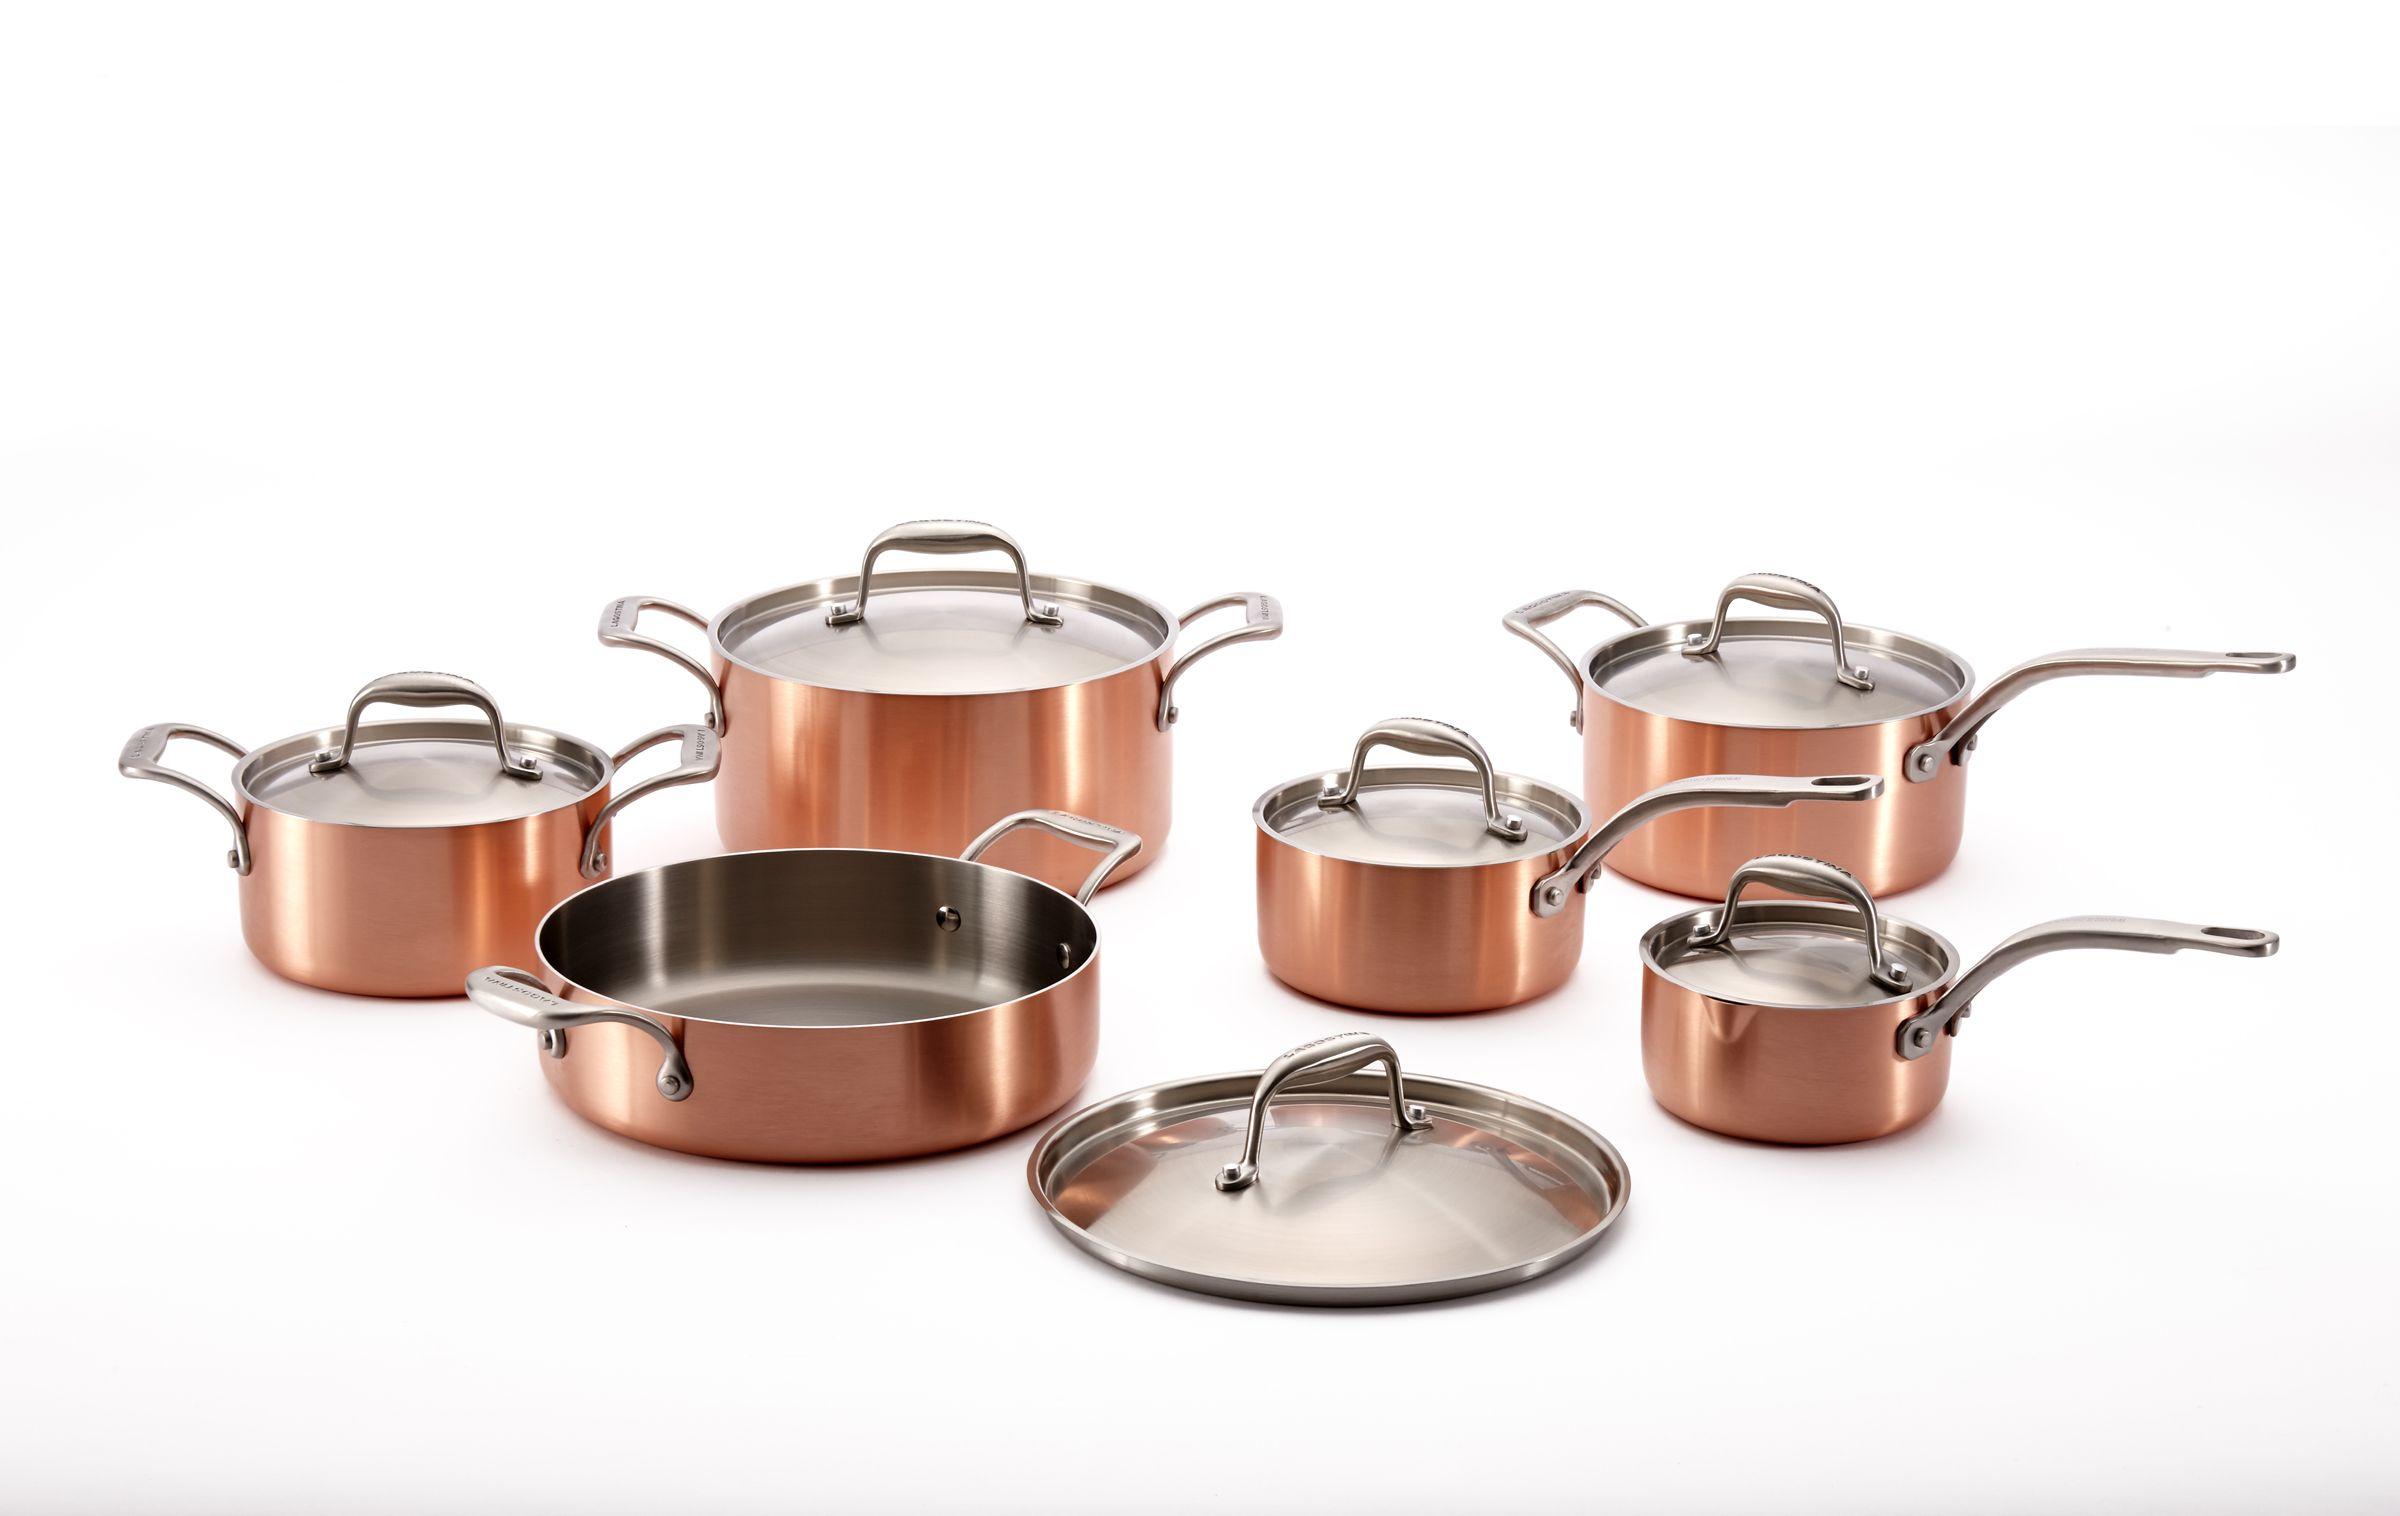 European Kitchen Gadgets Premium Cabinets Manufacturers Lagostina Copper Euro Clad 12 Pc Food Stuffs Tools